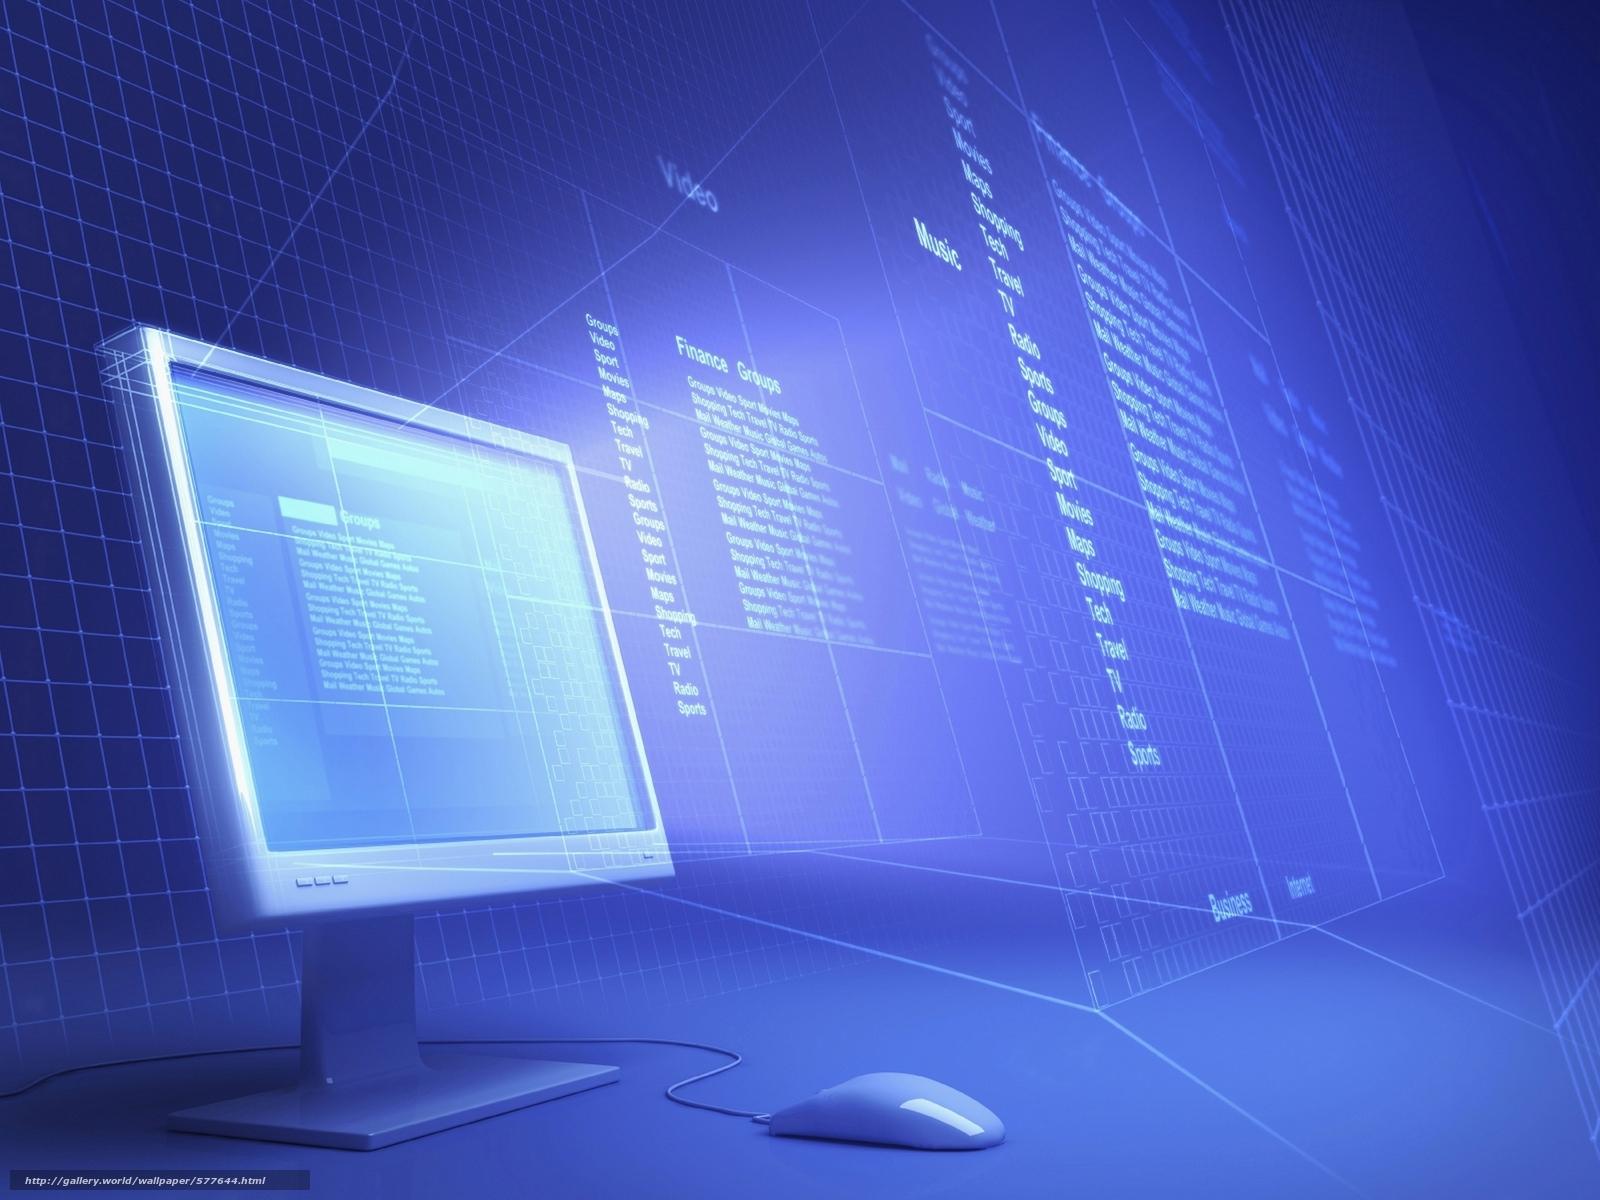 Обои на рабочий стол интернет компьютеры